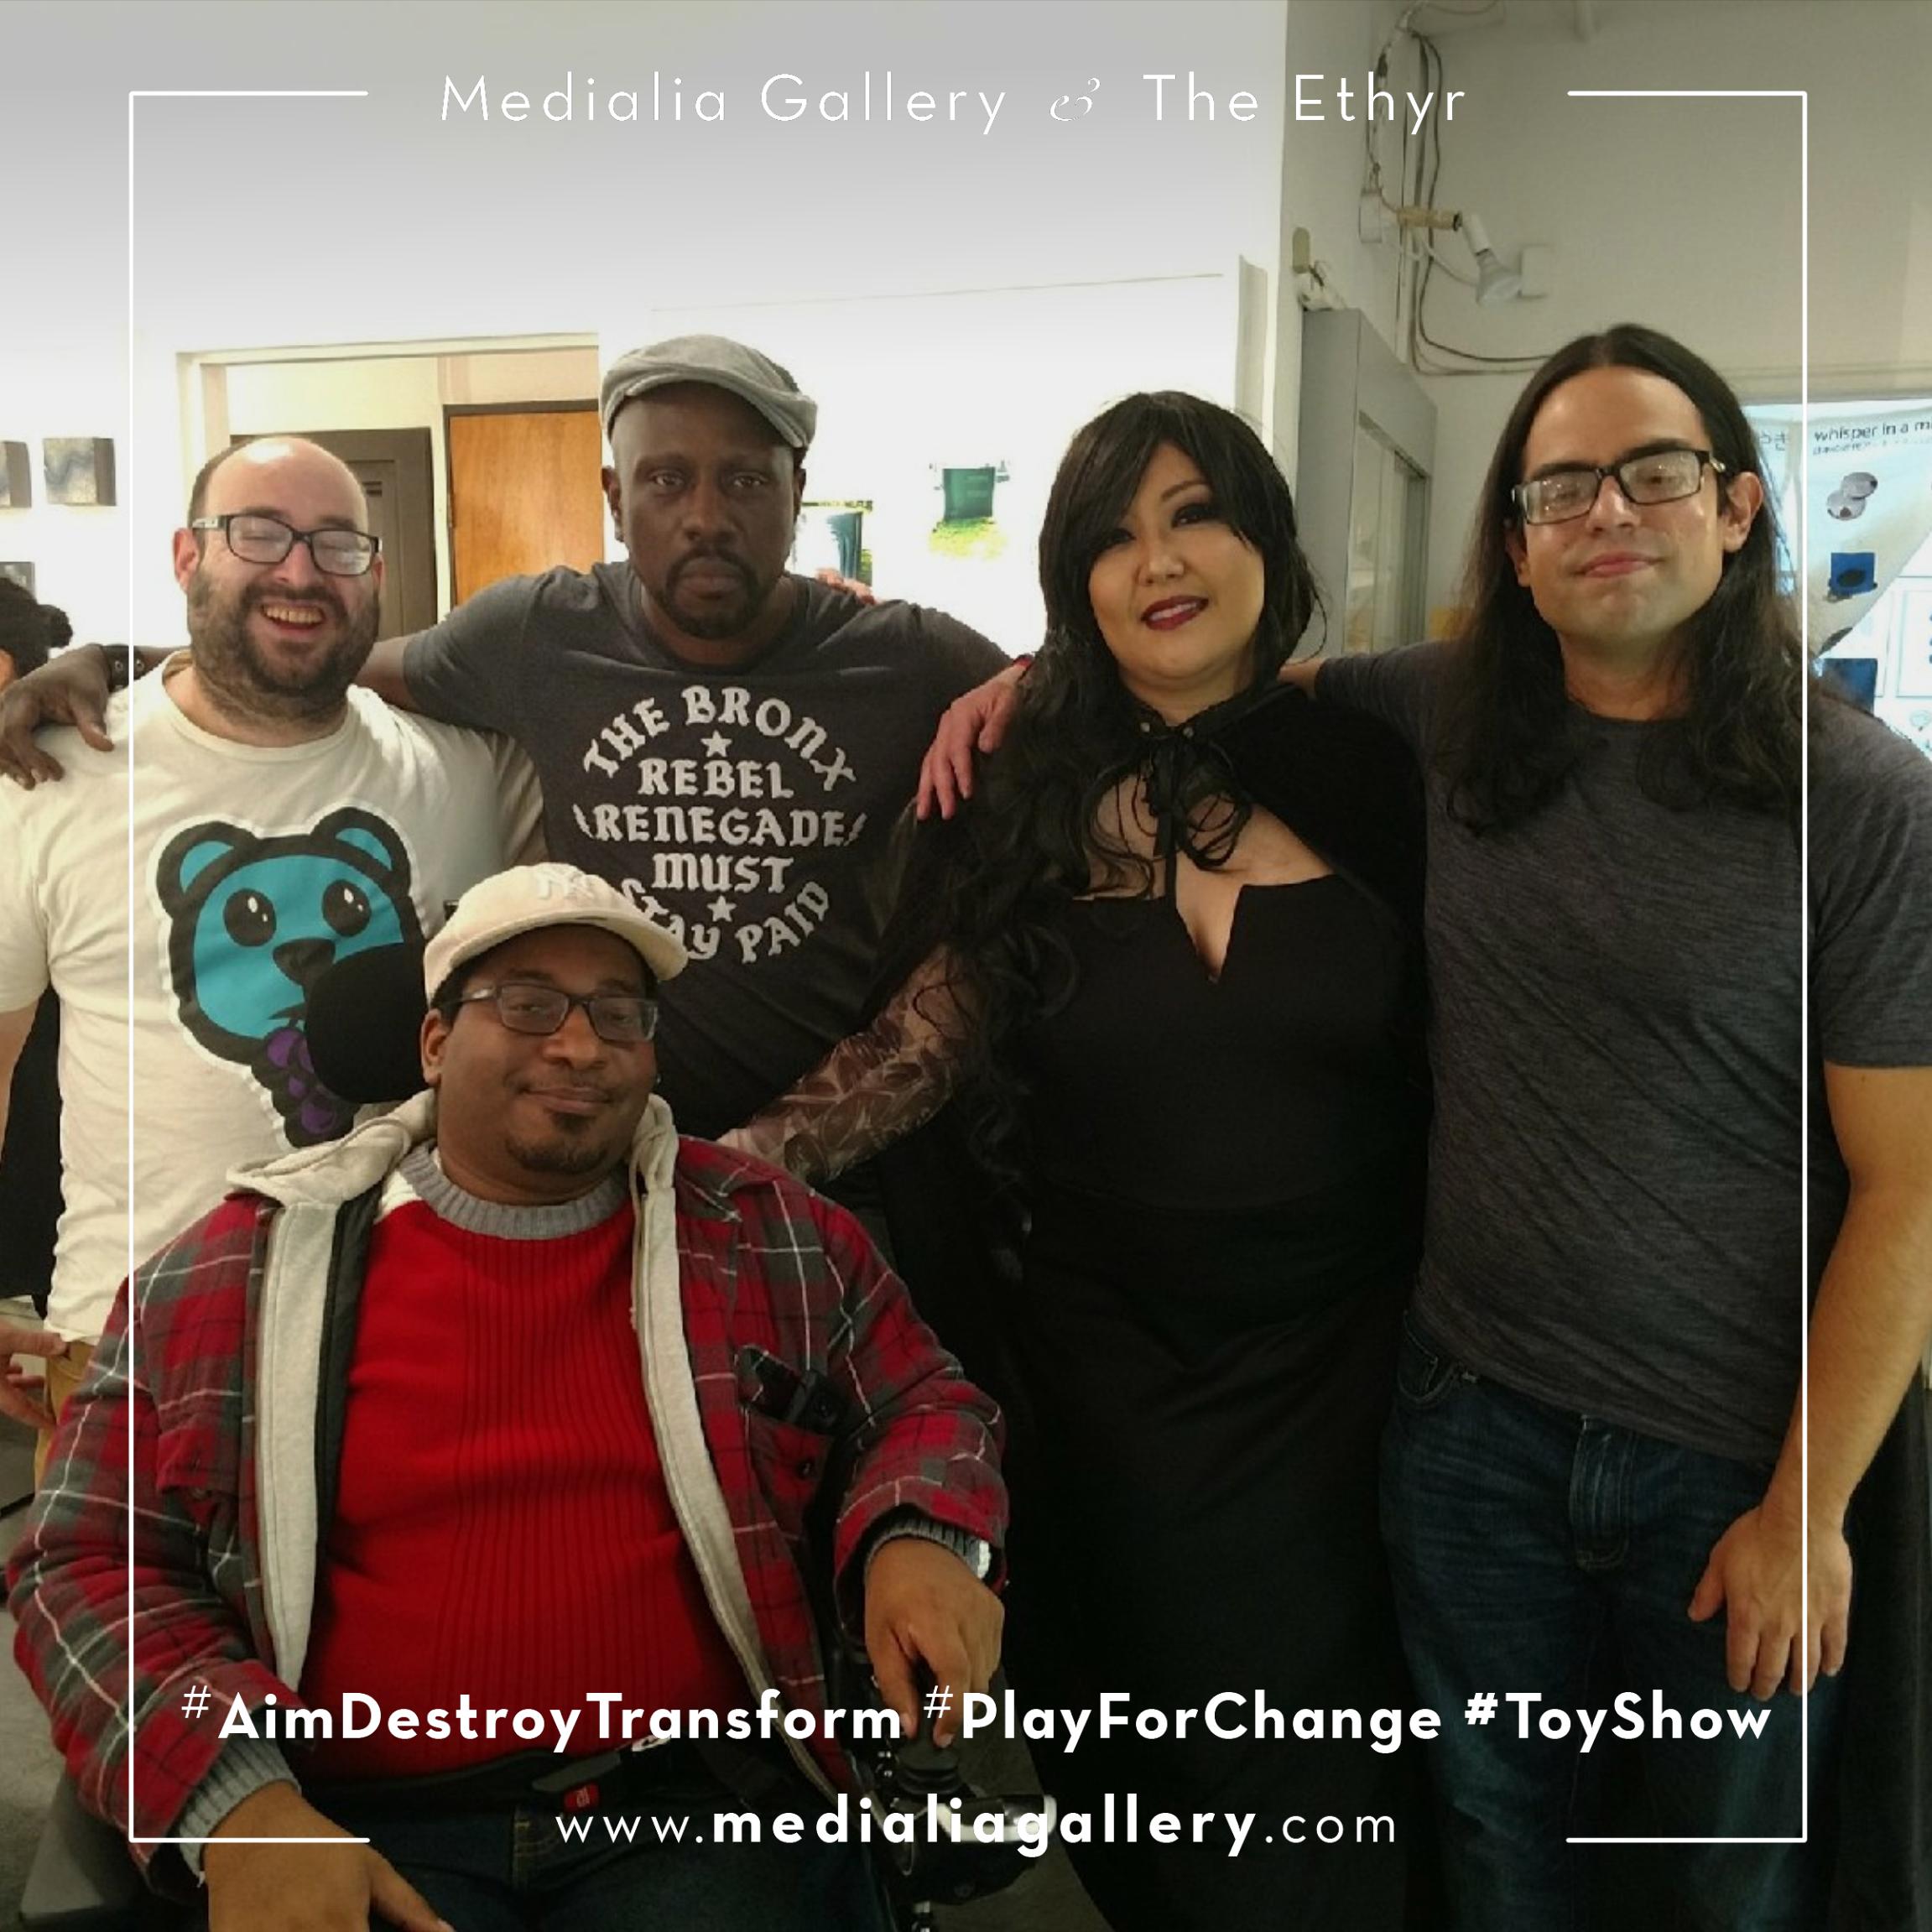 MedialiaGallery_The_Ethyr_AimDestroyTransform_Toy_Guests_II_November_2017.png